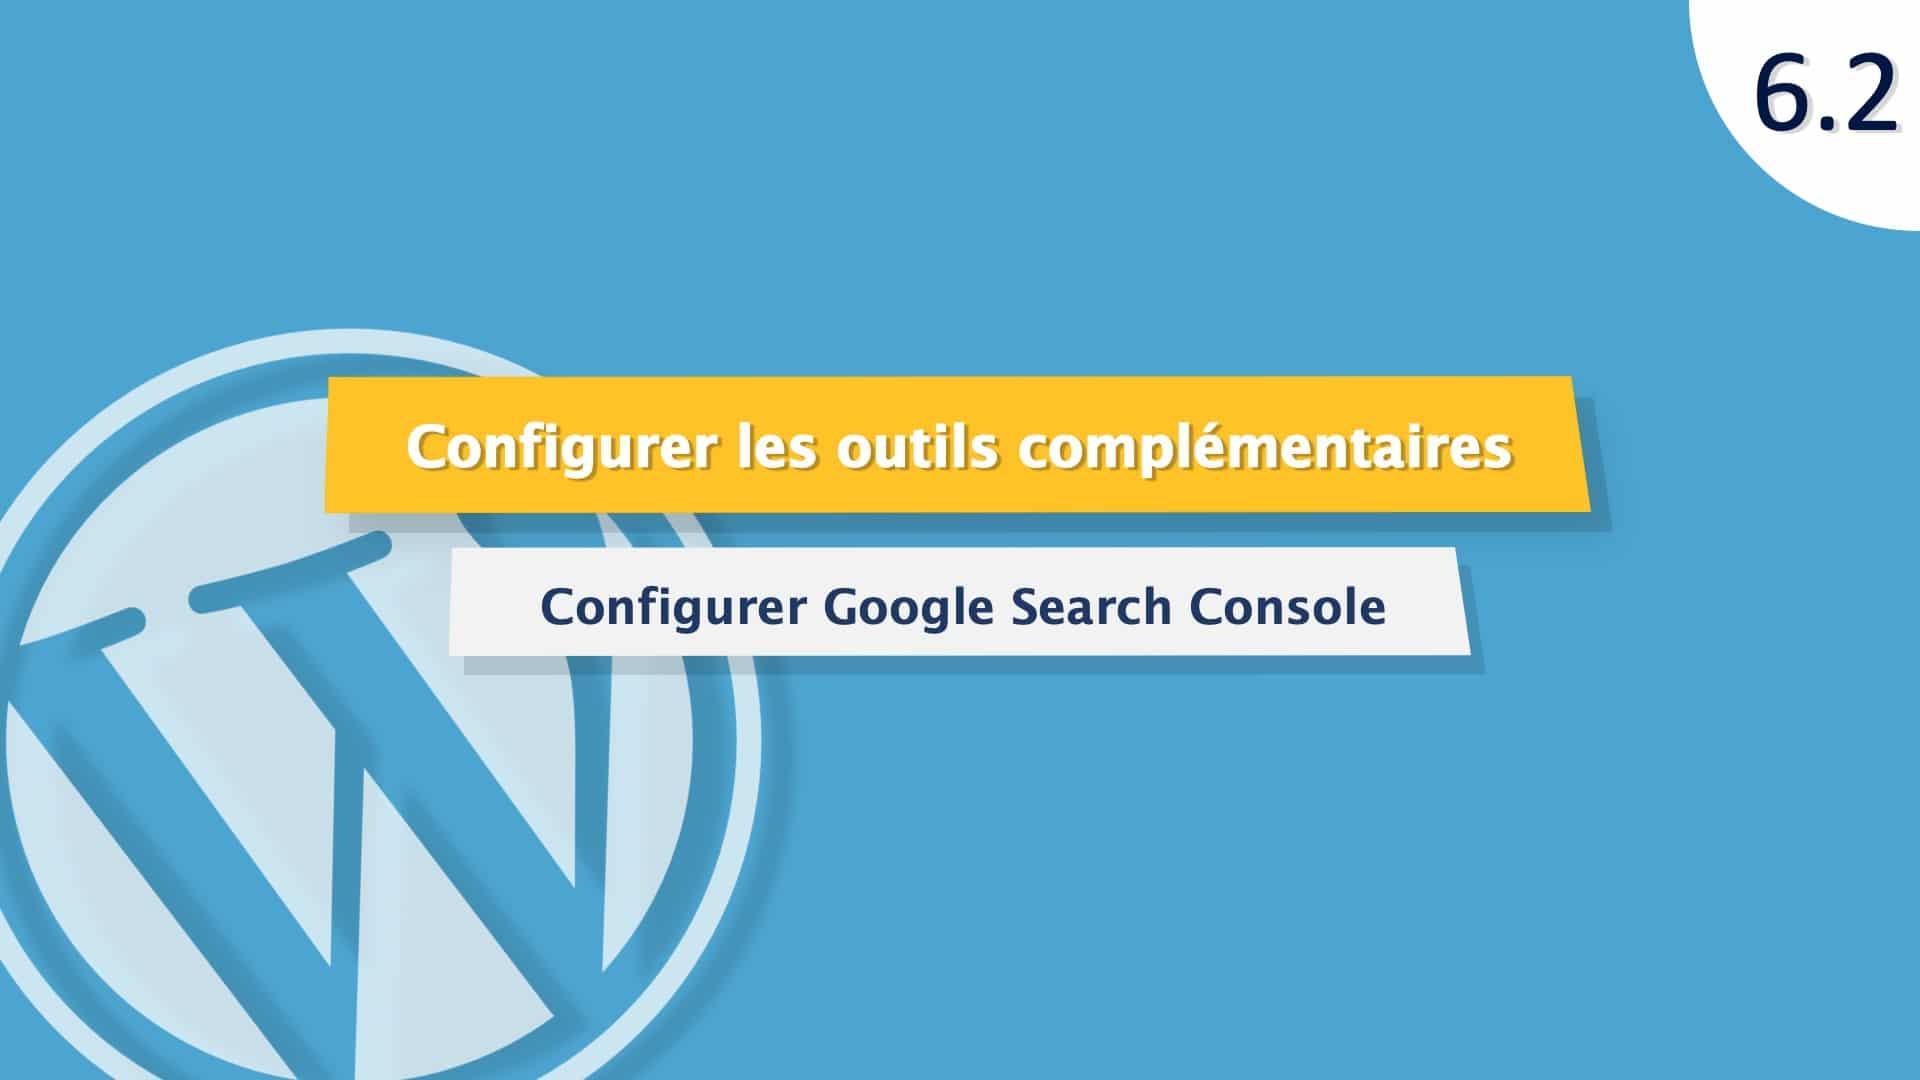 Tutoriel WordPress : Configurer Google Search console et un site WordPress